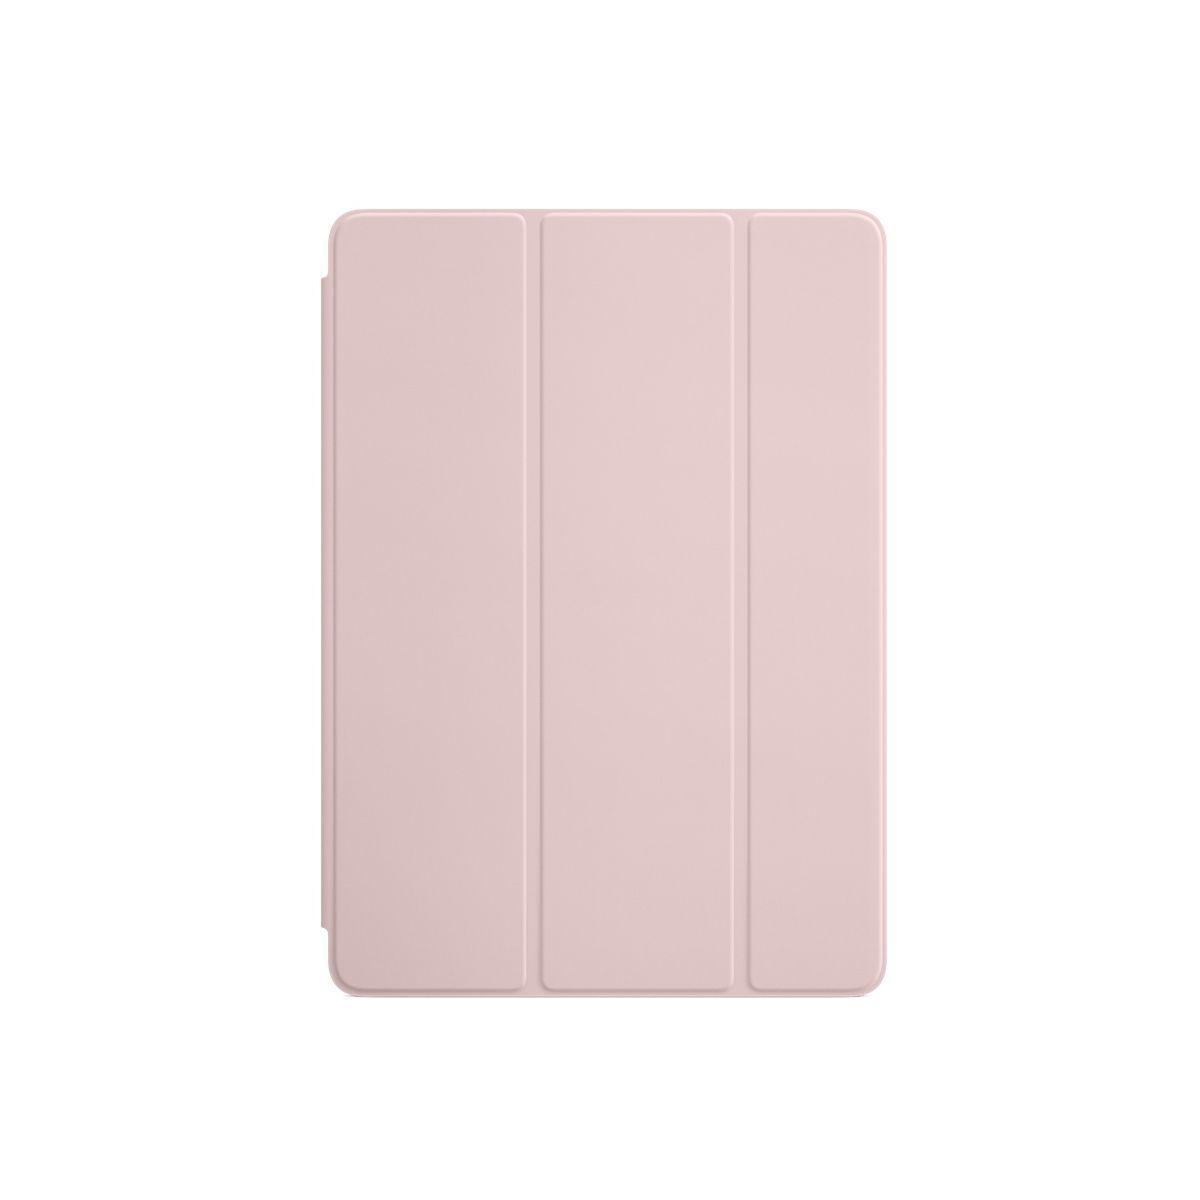 Etui tablette apple smart cover new ipad rose (photo)